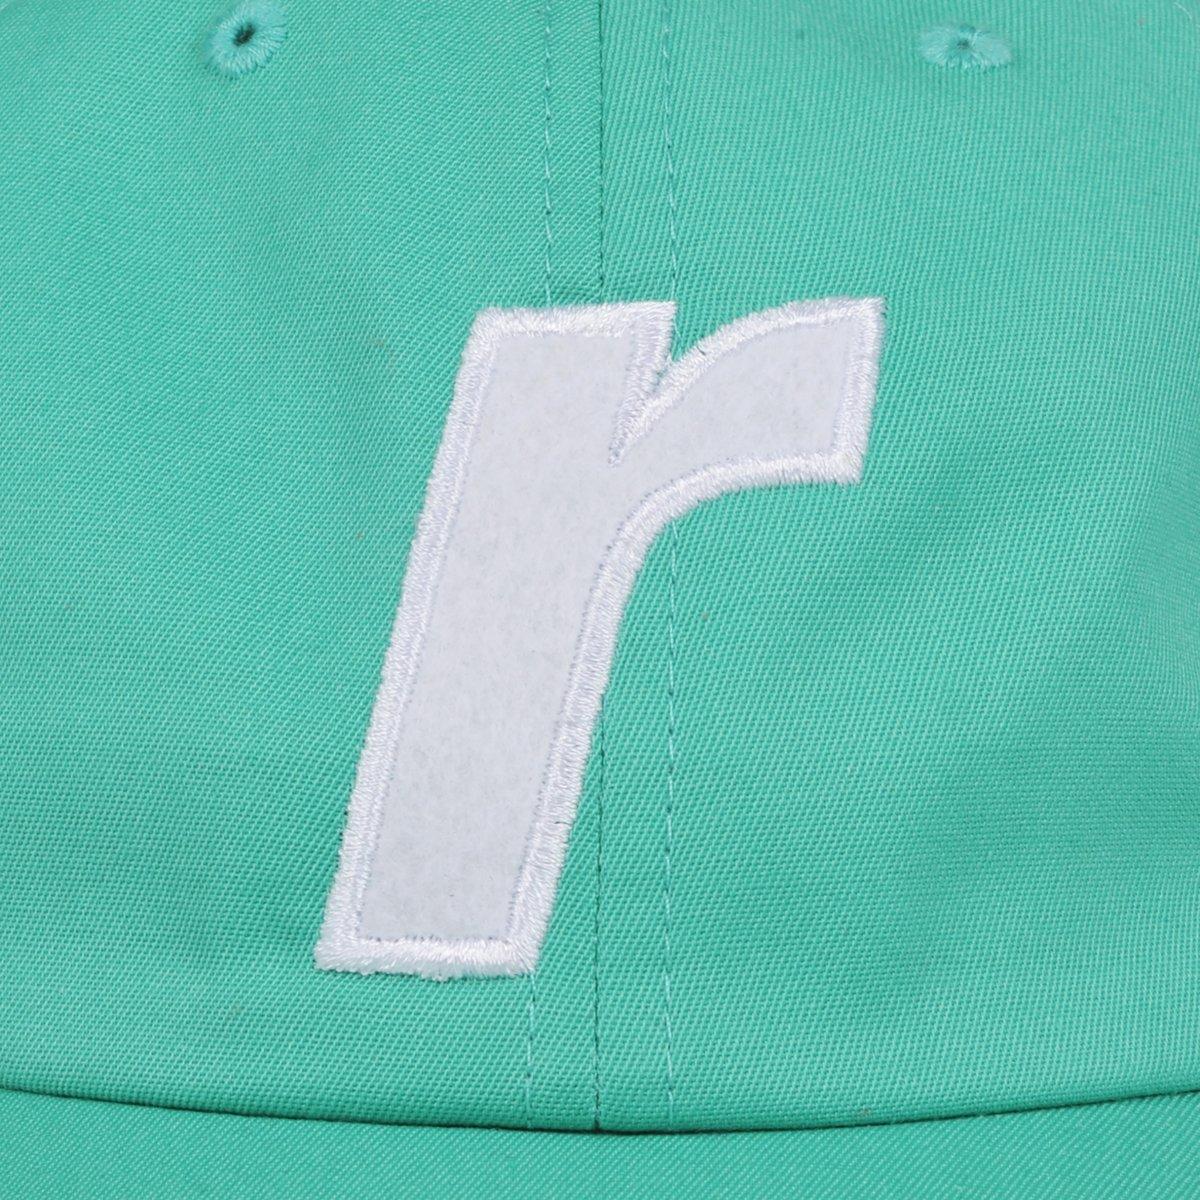 【RAVE SKATEBOARDS/レイブスケートボード】R LOGO CAP ダドキャップ / JADE